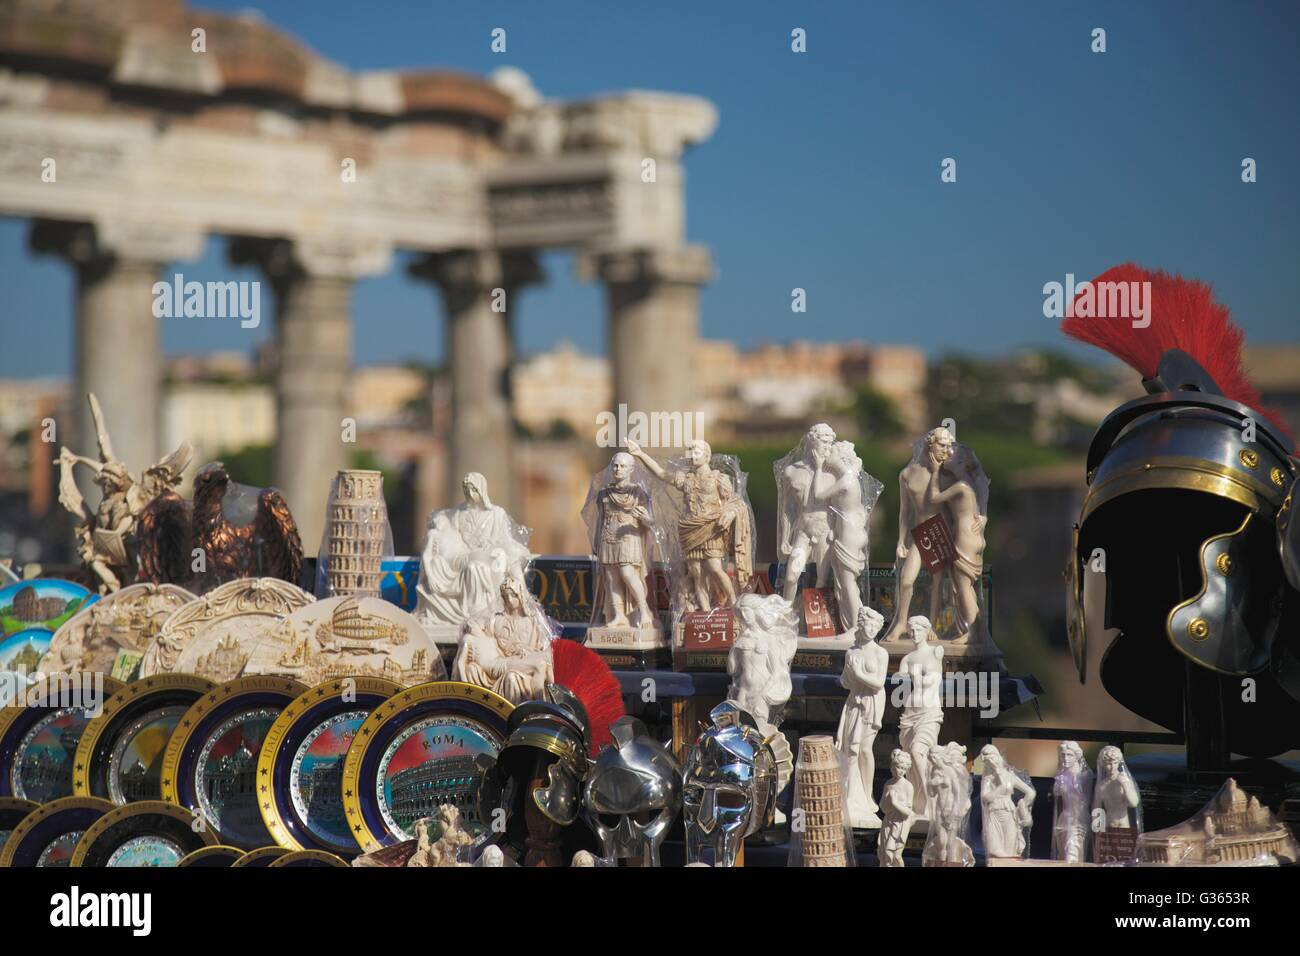 Recuerdos para la venta en el Foro Romano, Roma, Italia, Europa Imagen De Stock